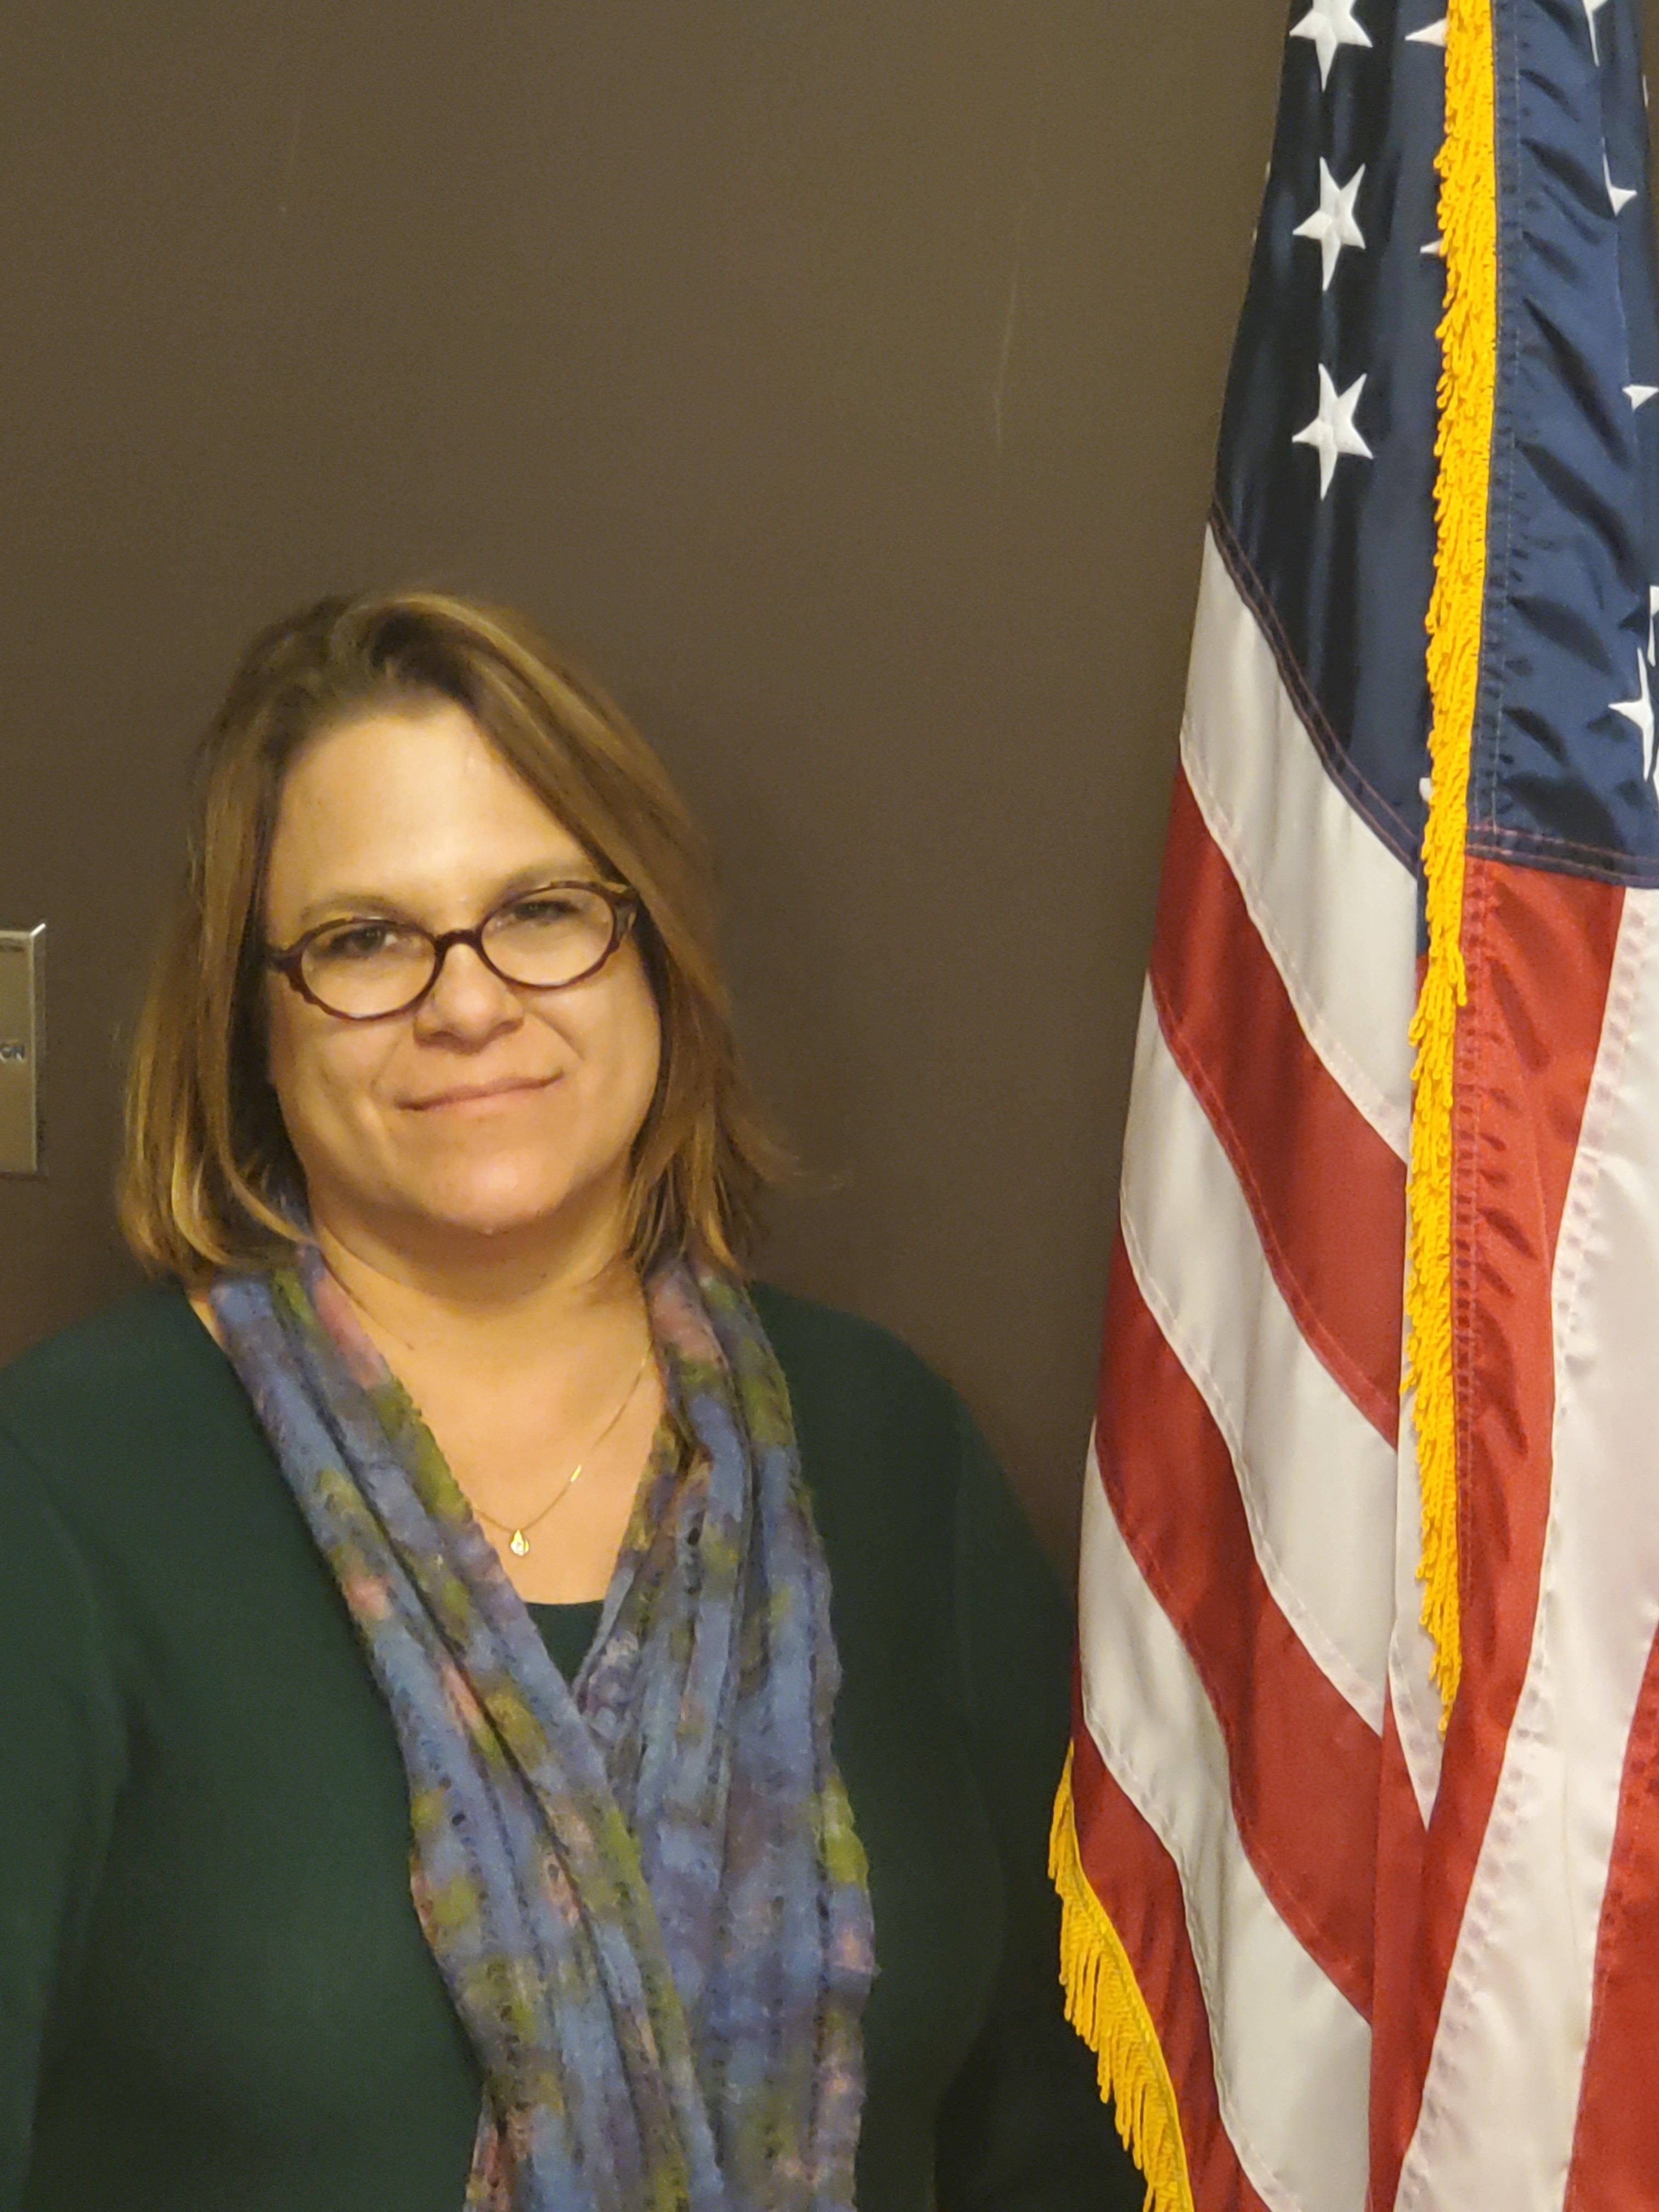 Vice President Zoey Loomis